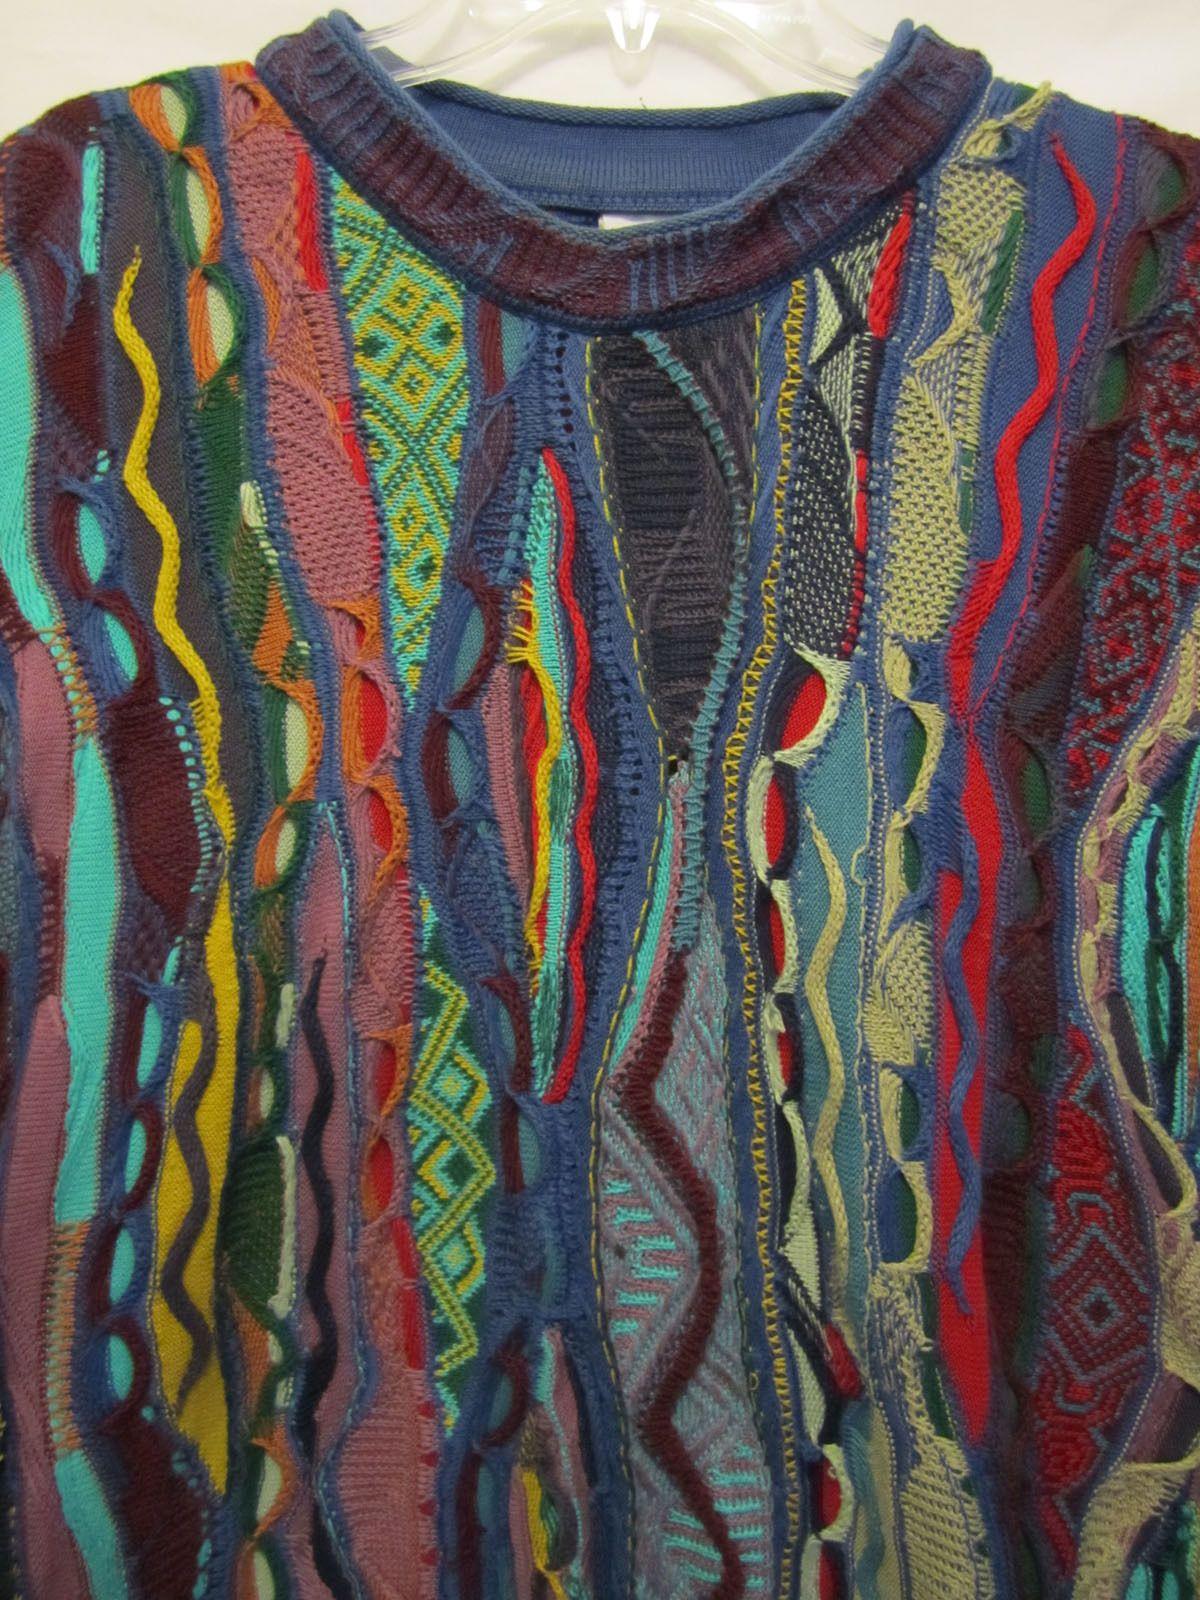 Vintage COOGI Australia Mercerised Cotton Sweater Cosby Hip Hop Biggie L Large https://t.co/FhfkTaIdgm https://t.co/6DwtbHoEUq